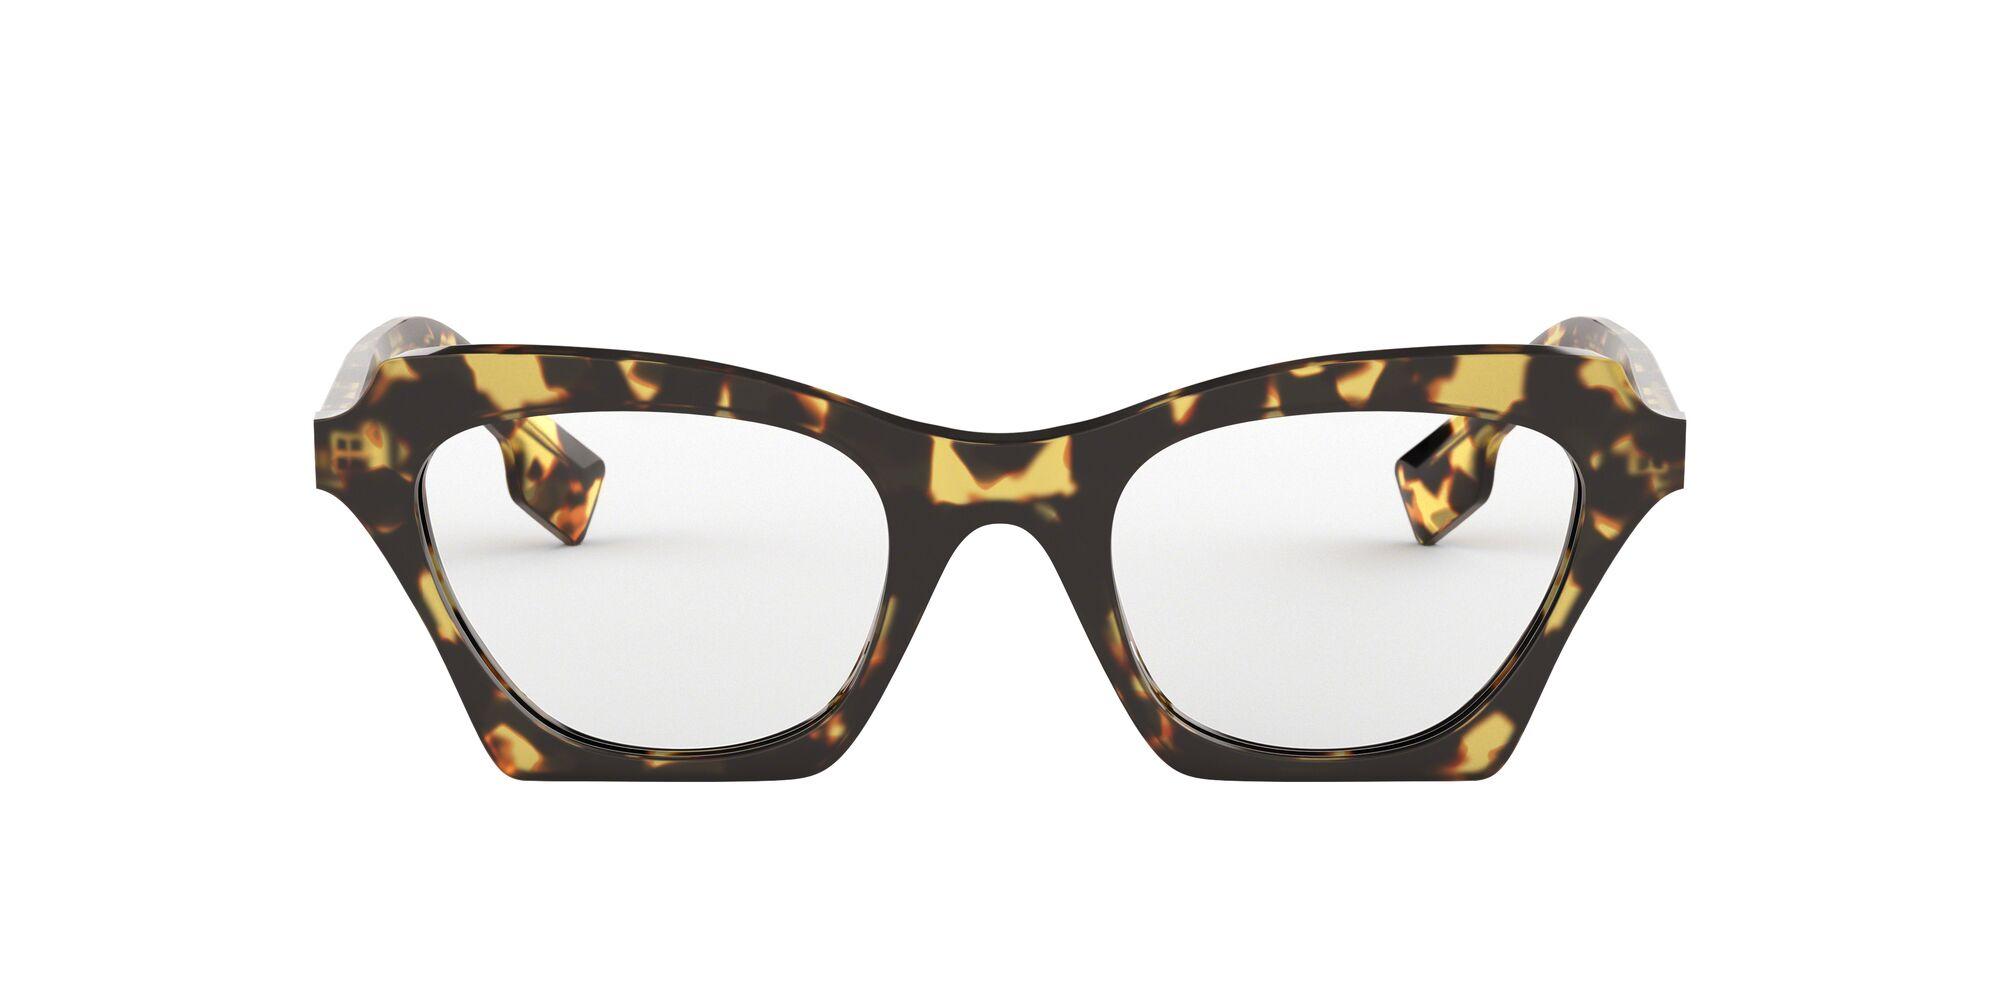 Montature occhiali da vista donna - Lbo Shop